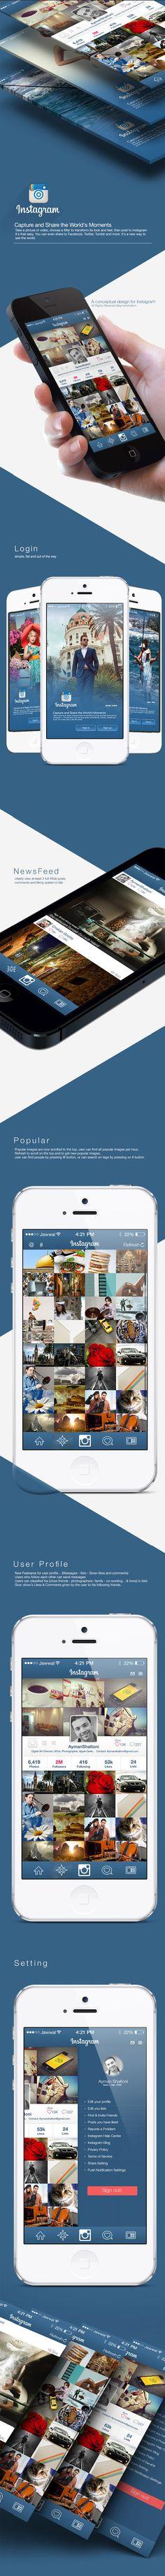 509 best Mobile UI | Photos images on Pinterest | App design, Apple ...